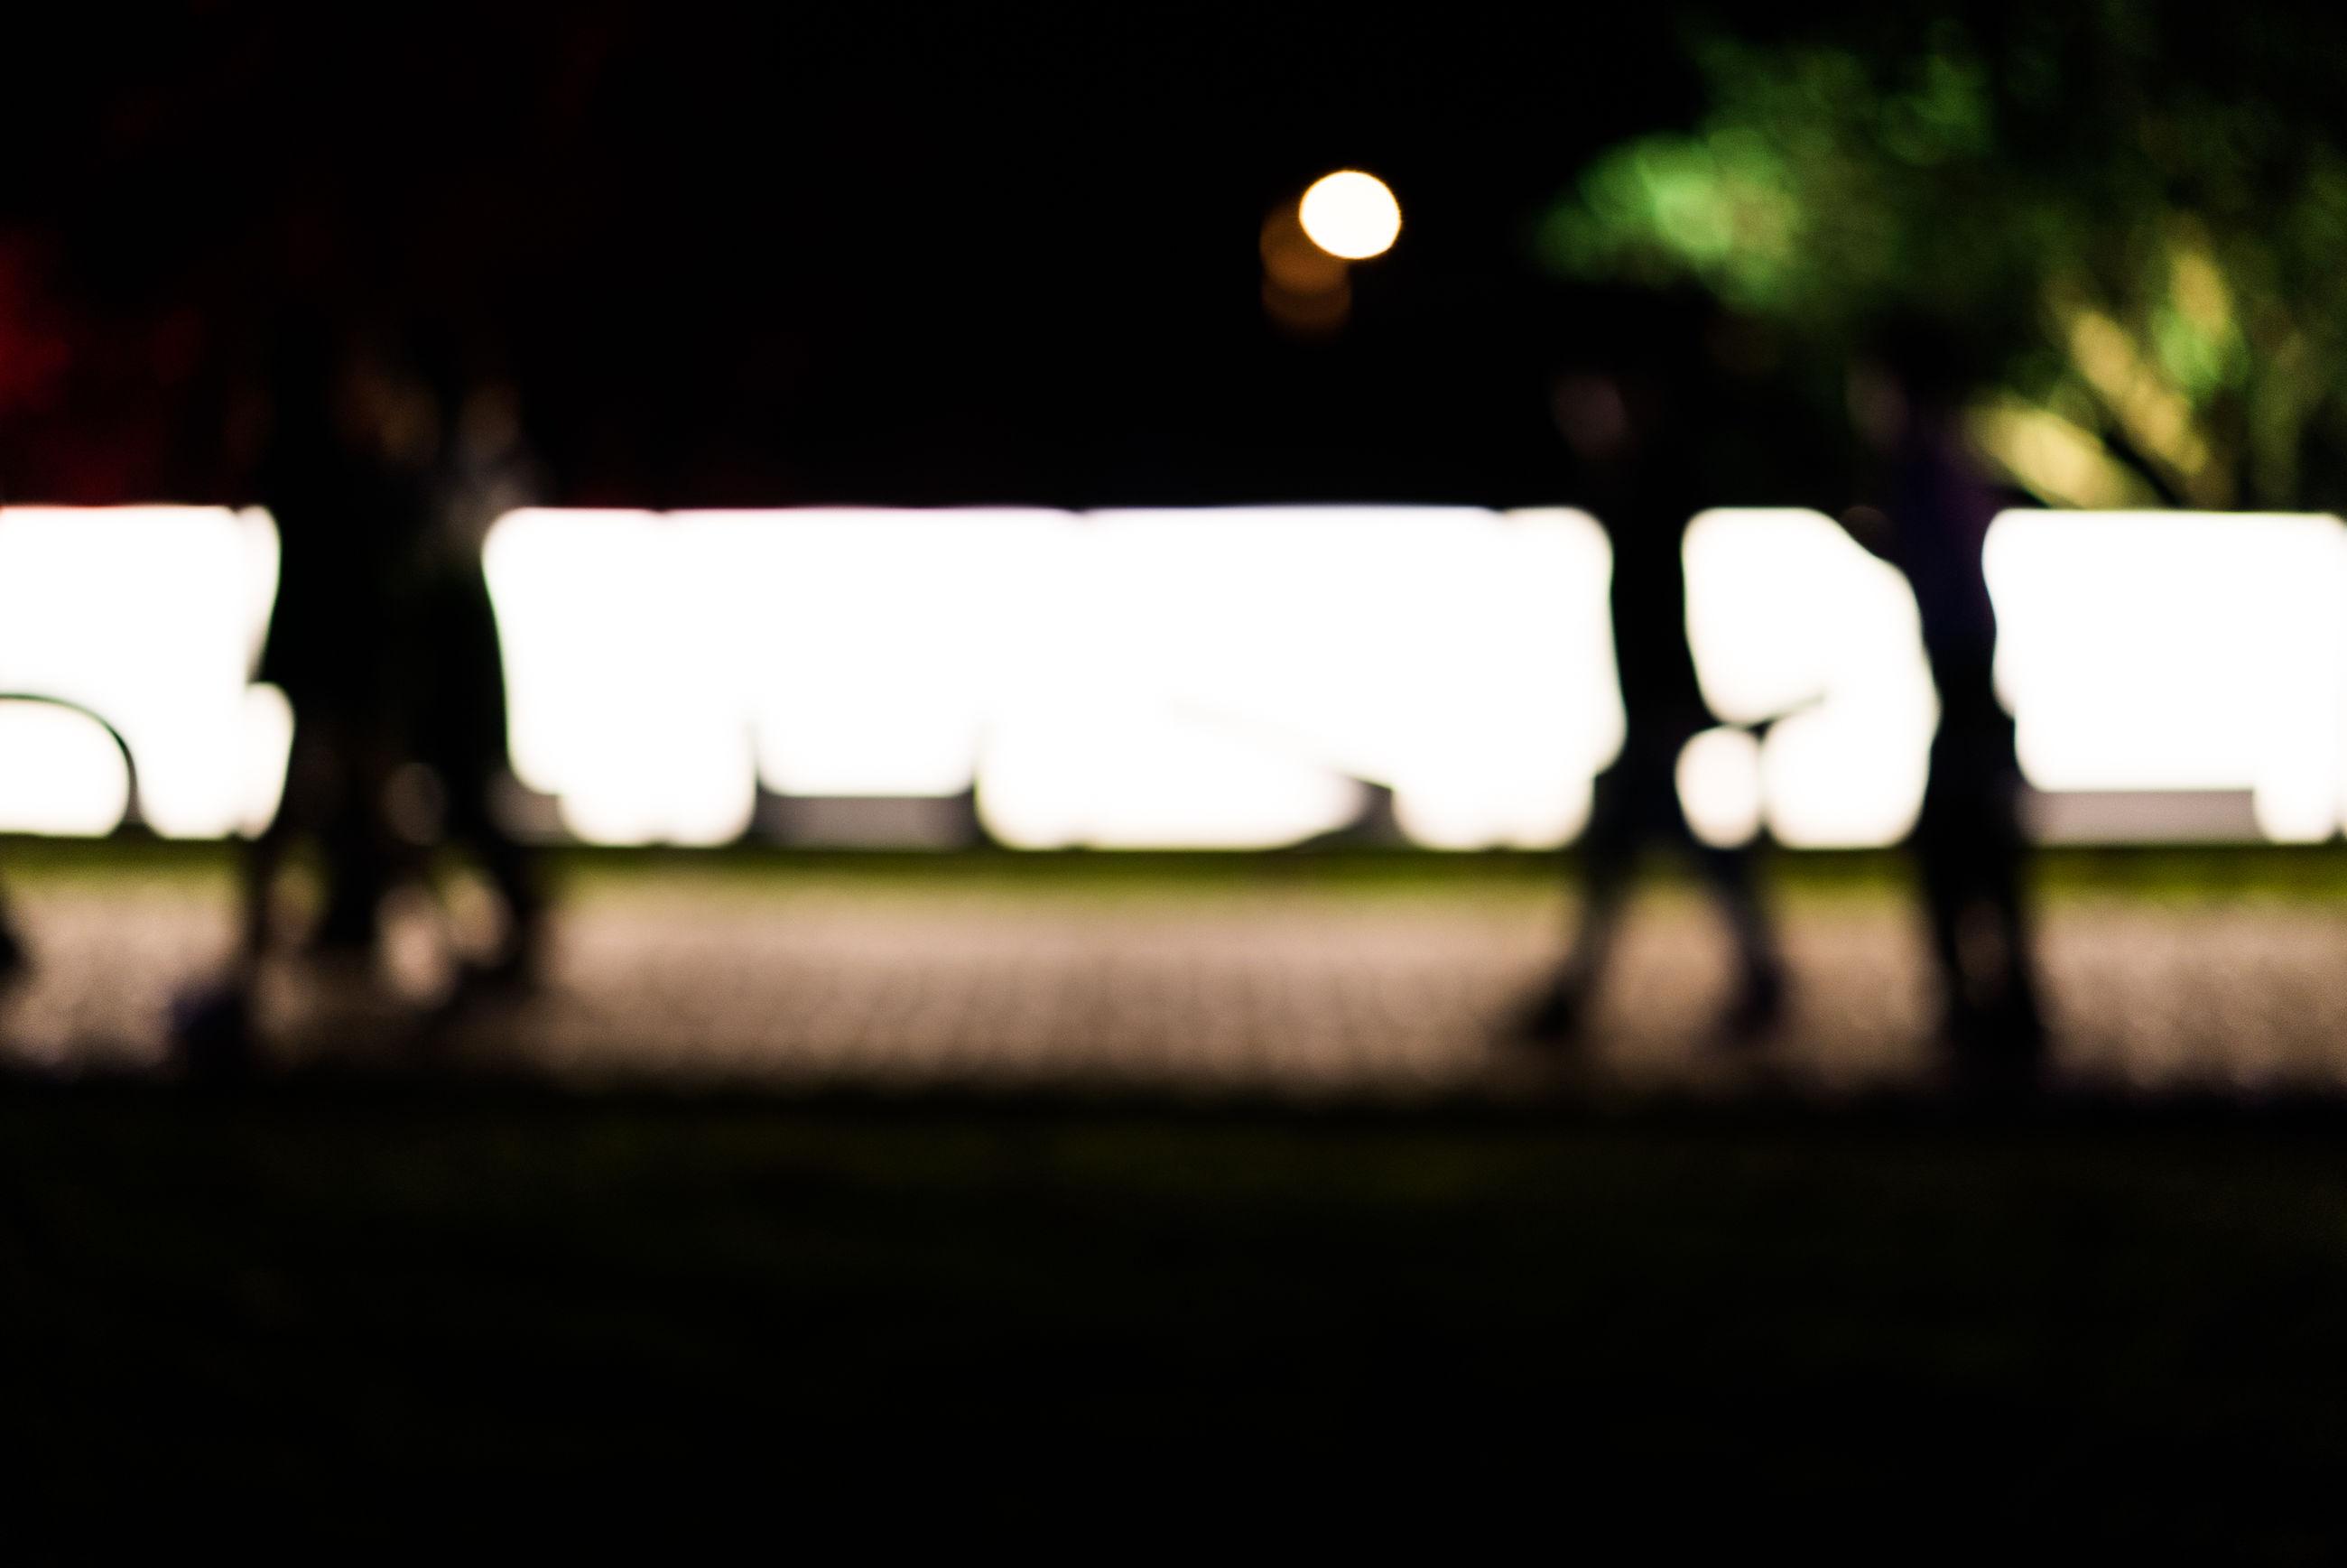 CLOSE-UP OF ILLUMINATED LIGHTING EQUIPMENT ON FIELD AGAINST NIGHT